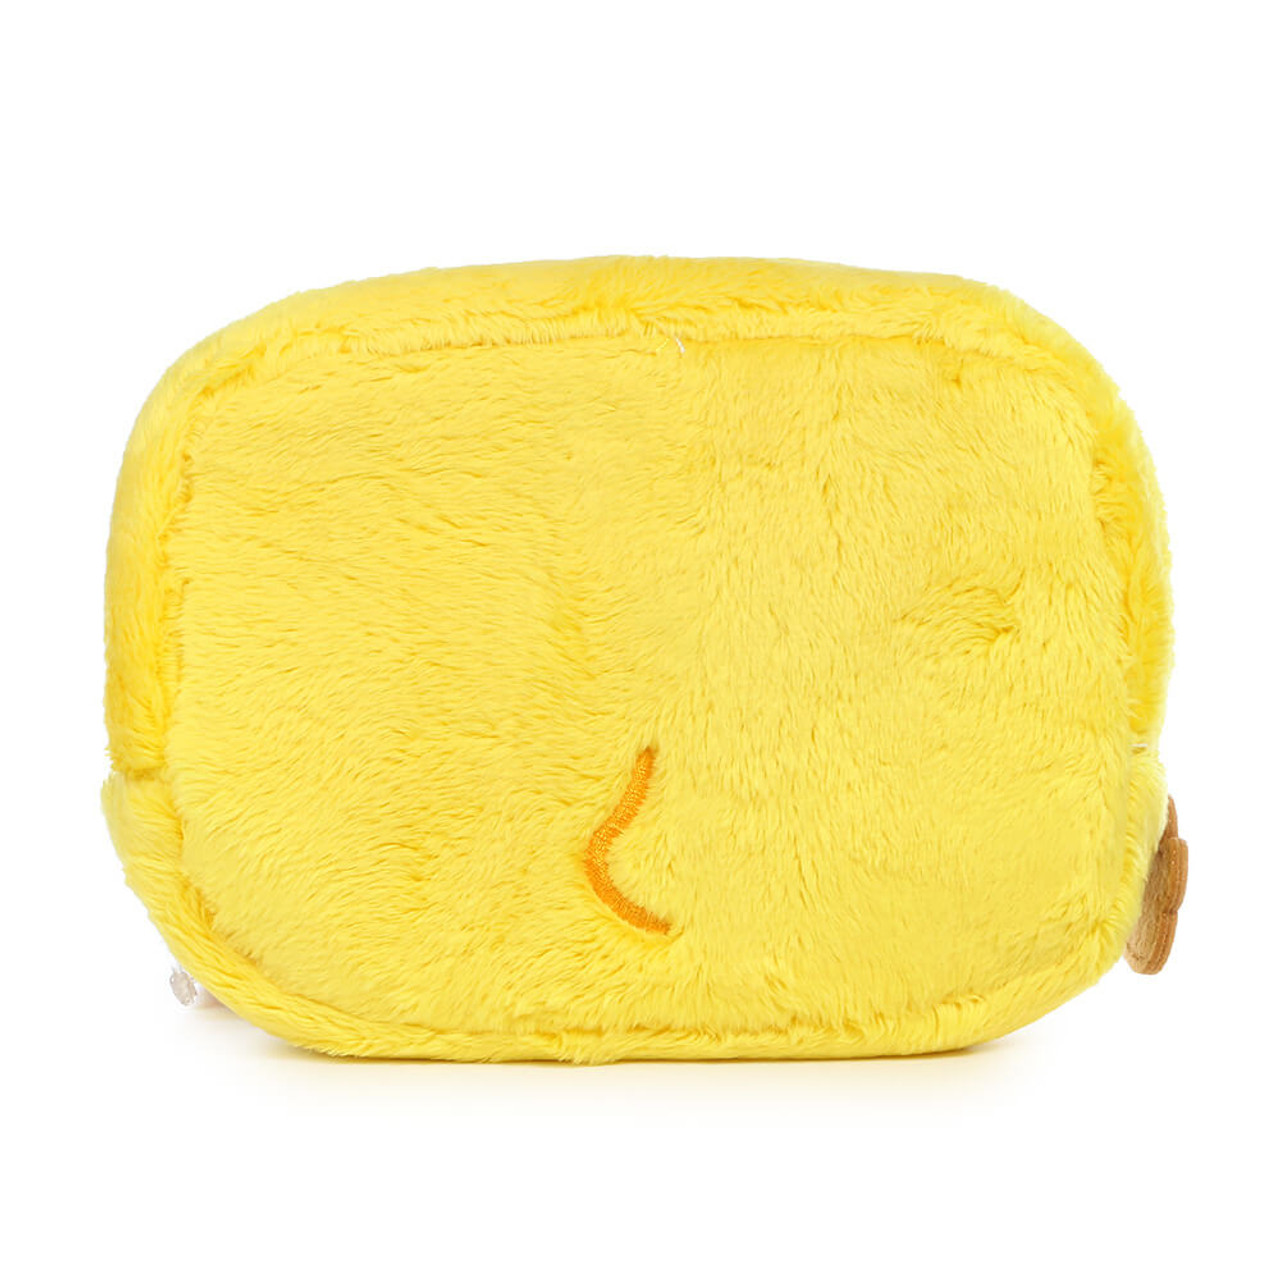 San-x Kiiroitori Yellow Chick Rectangle Face Plush Cosmetic Pouch ( Back View )